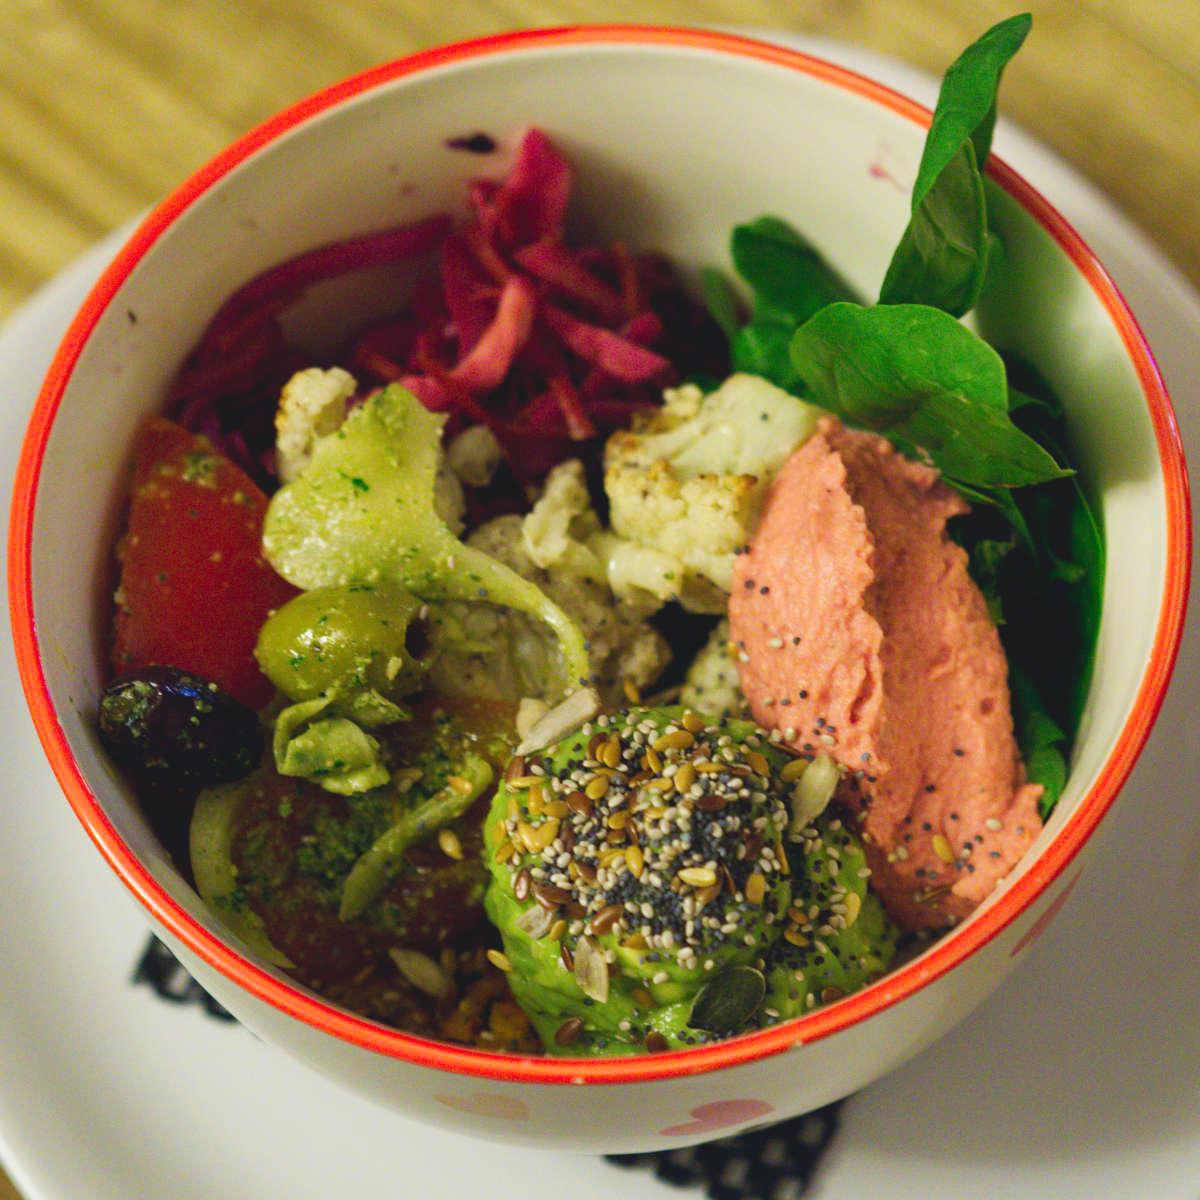 Vegan buddha bowl at Roots, Edinburgh